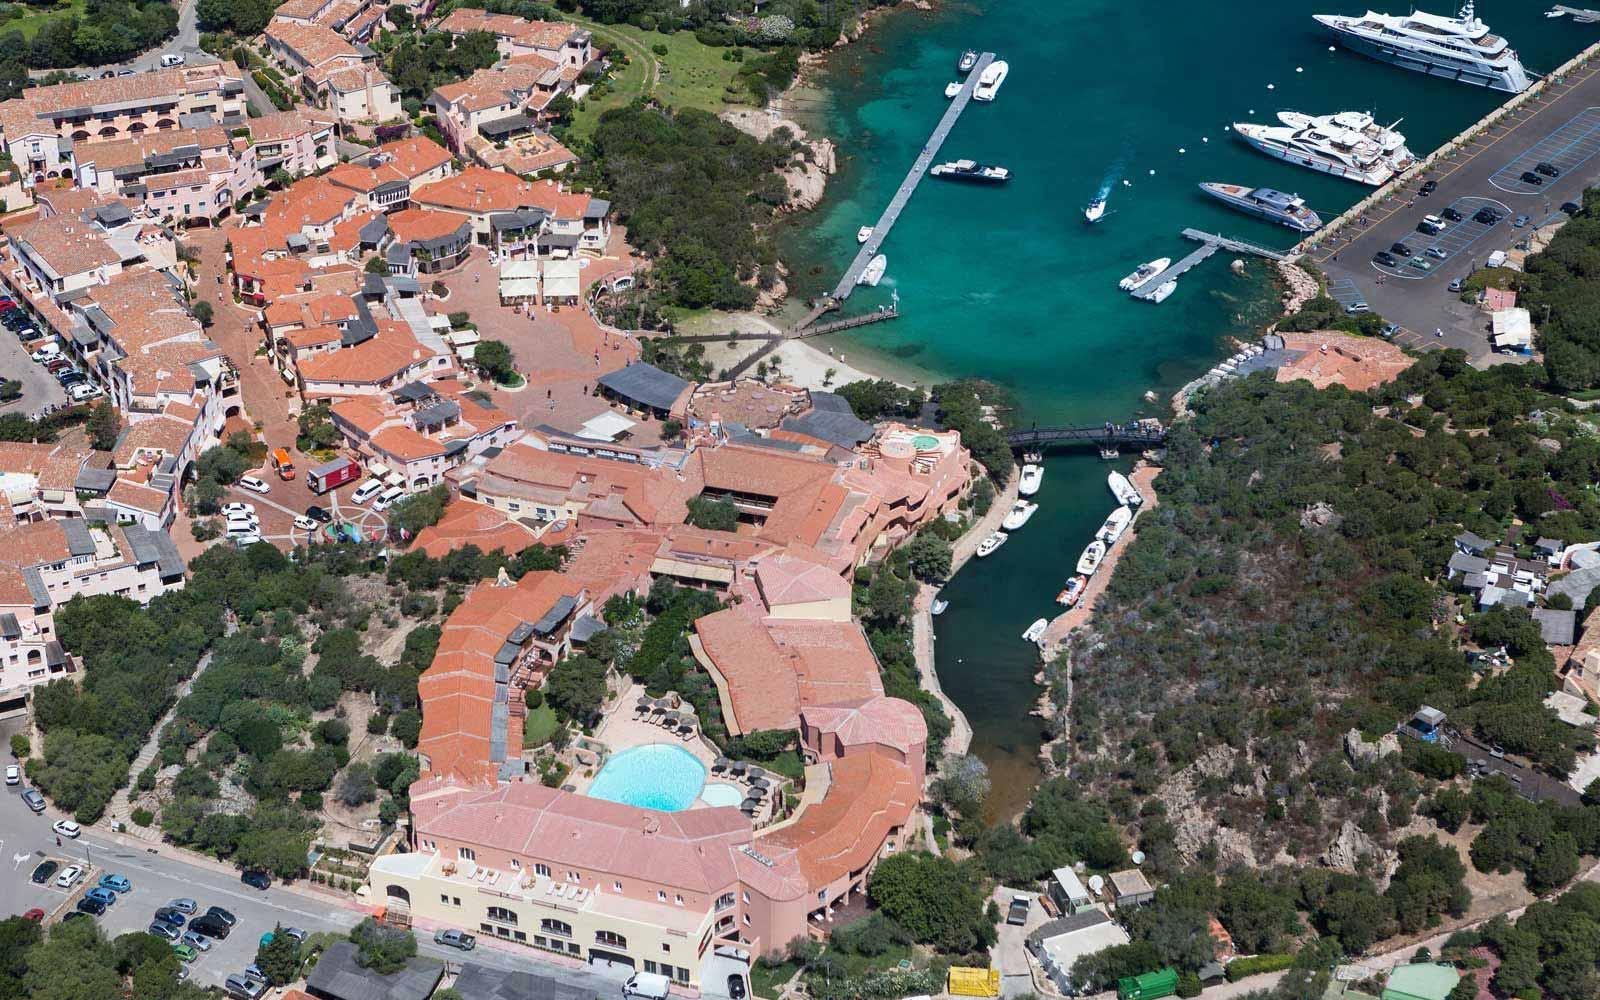 Aerial View of Cervo Hotel